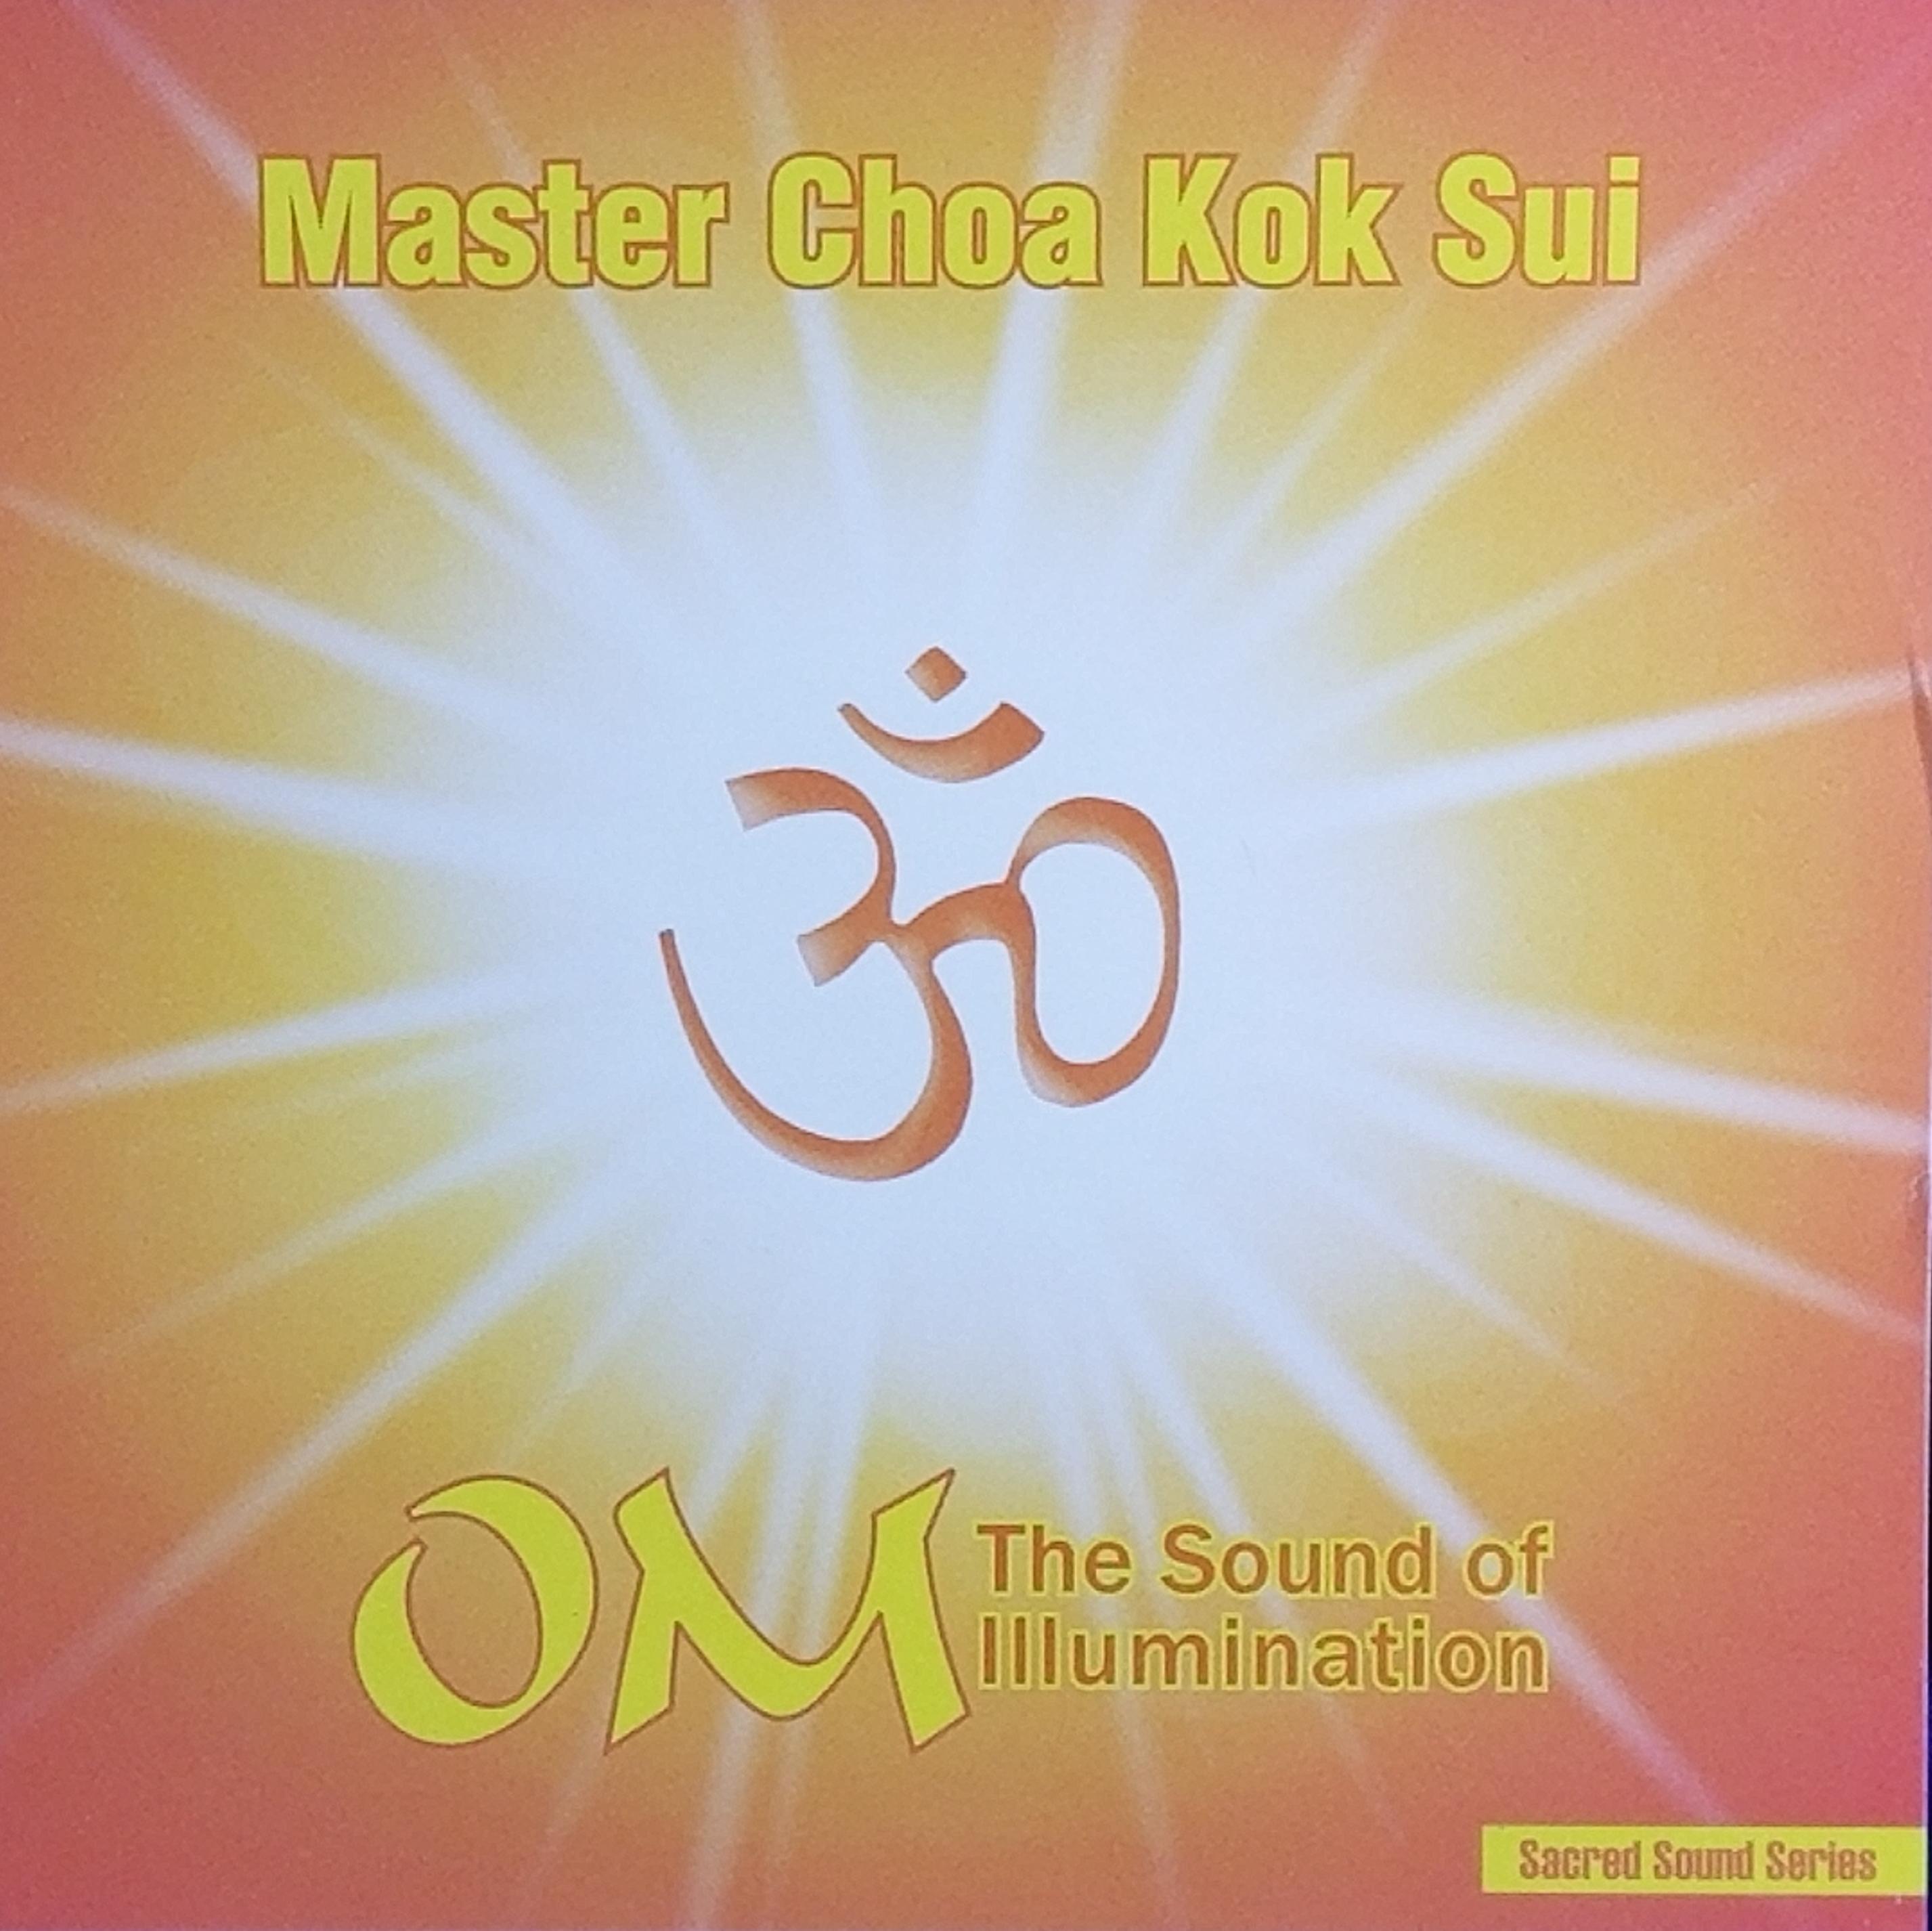 Om the Sound of Illumination